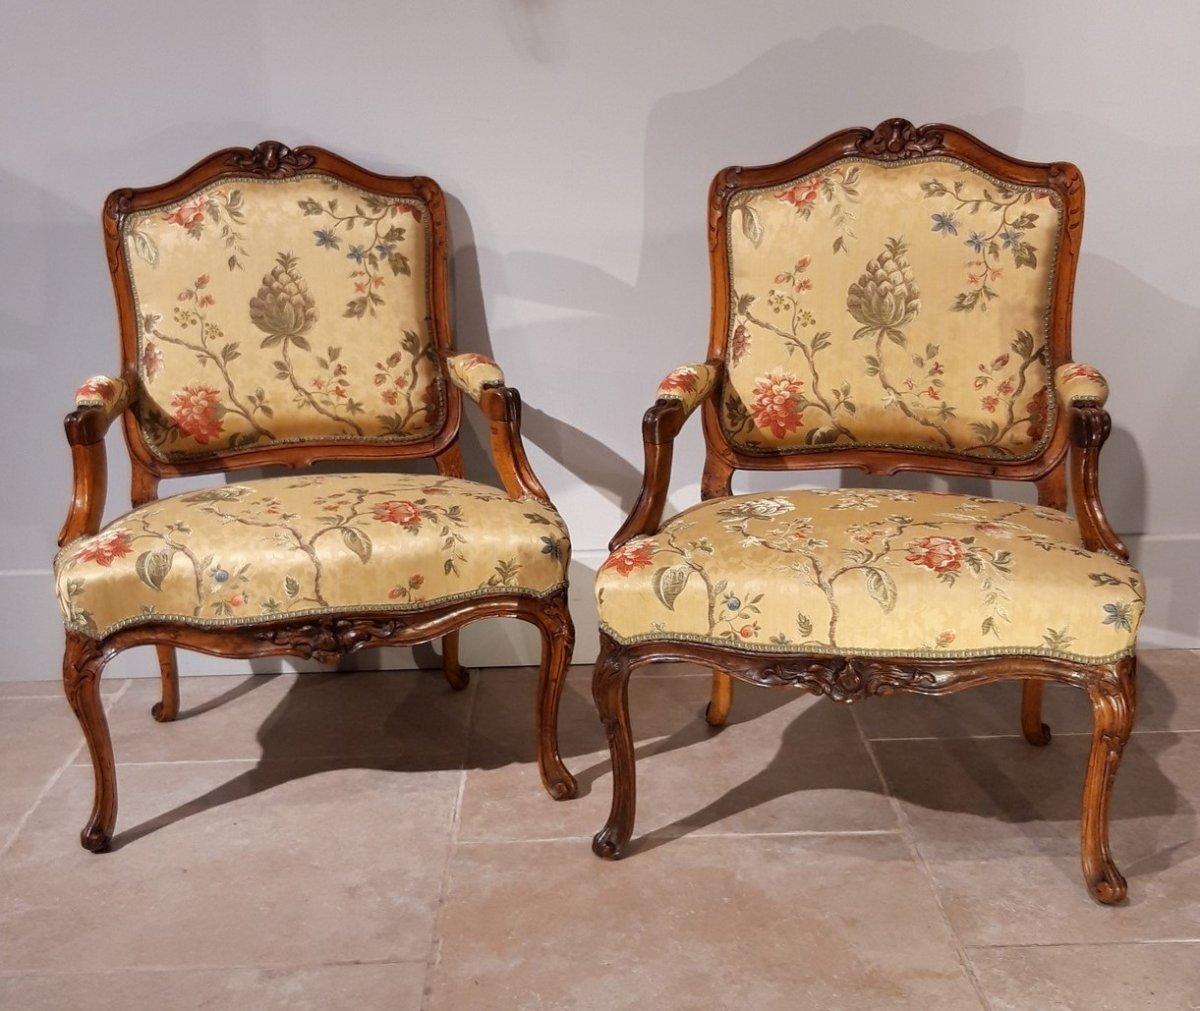 Paire de fauteuils Louis XV en noyer époque XVIII°